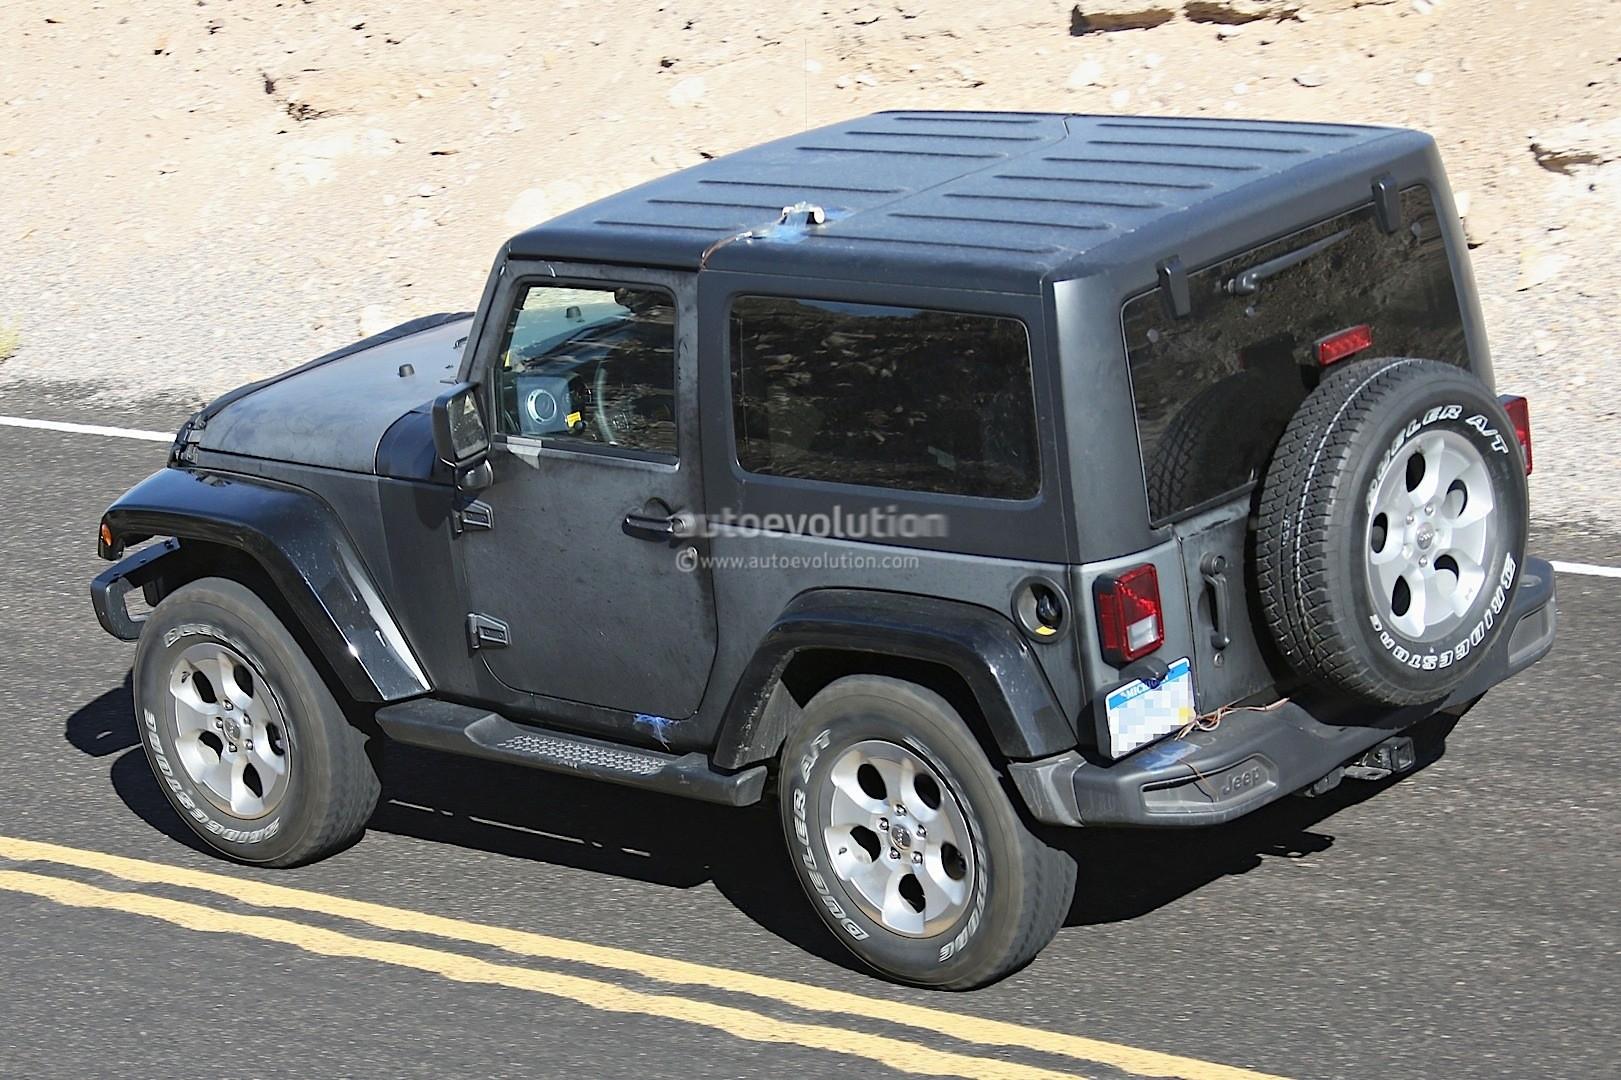 UPDATE: 2018 Jeep Wrangler (JL) to Get 2.0 Hurricane Turbo ...